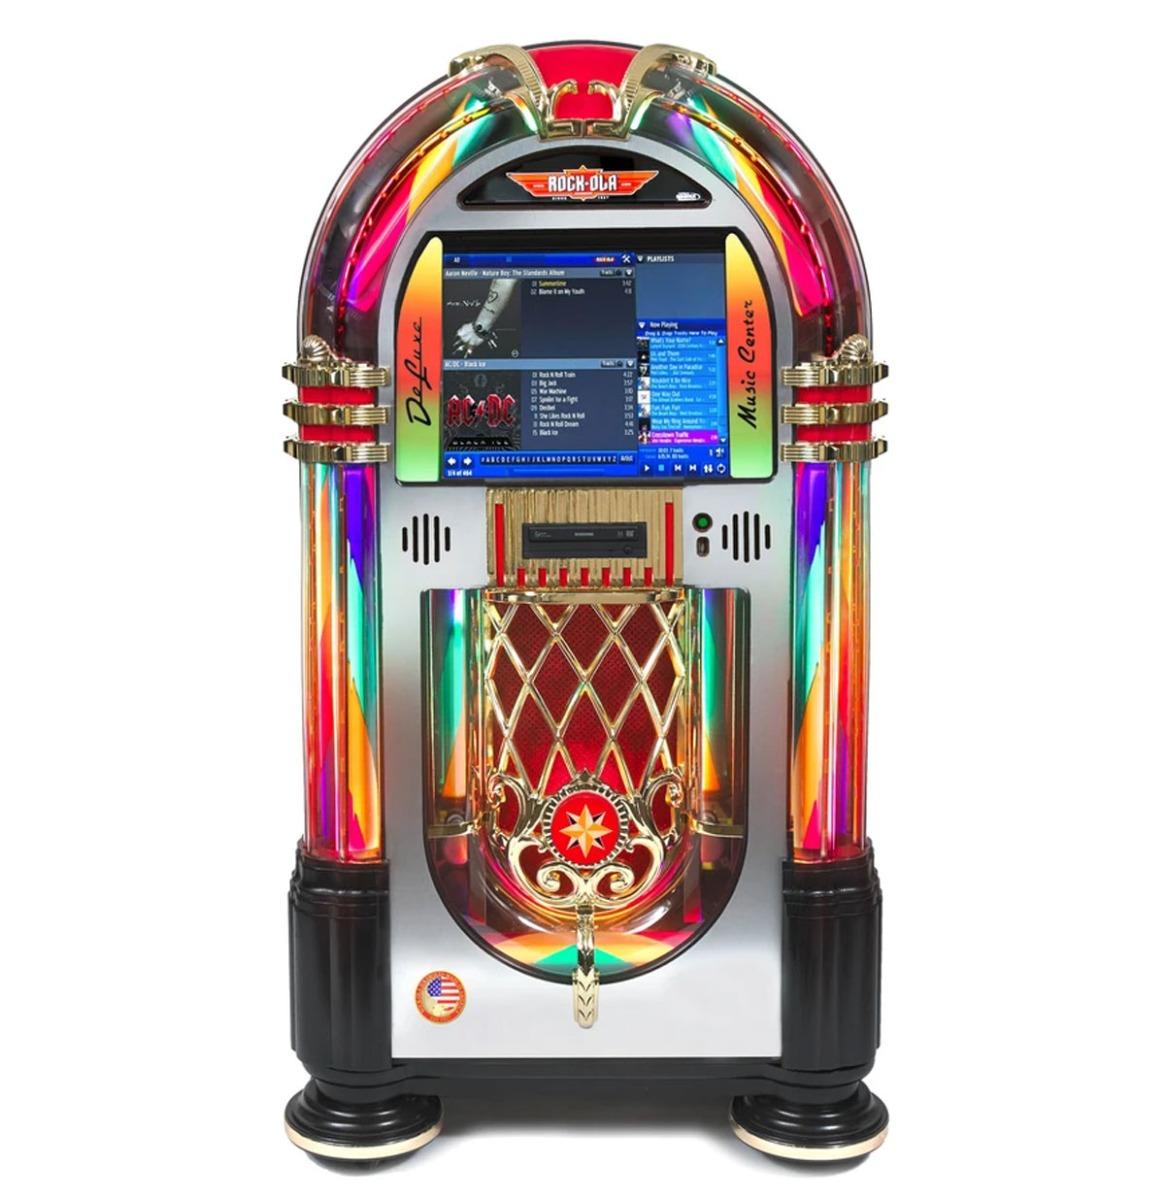 Rock-Ola DeLuxe Digital Music Center Jukebox - Crystal Editie